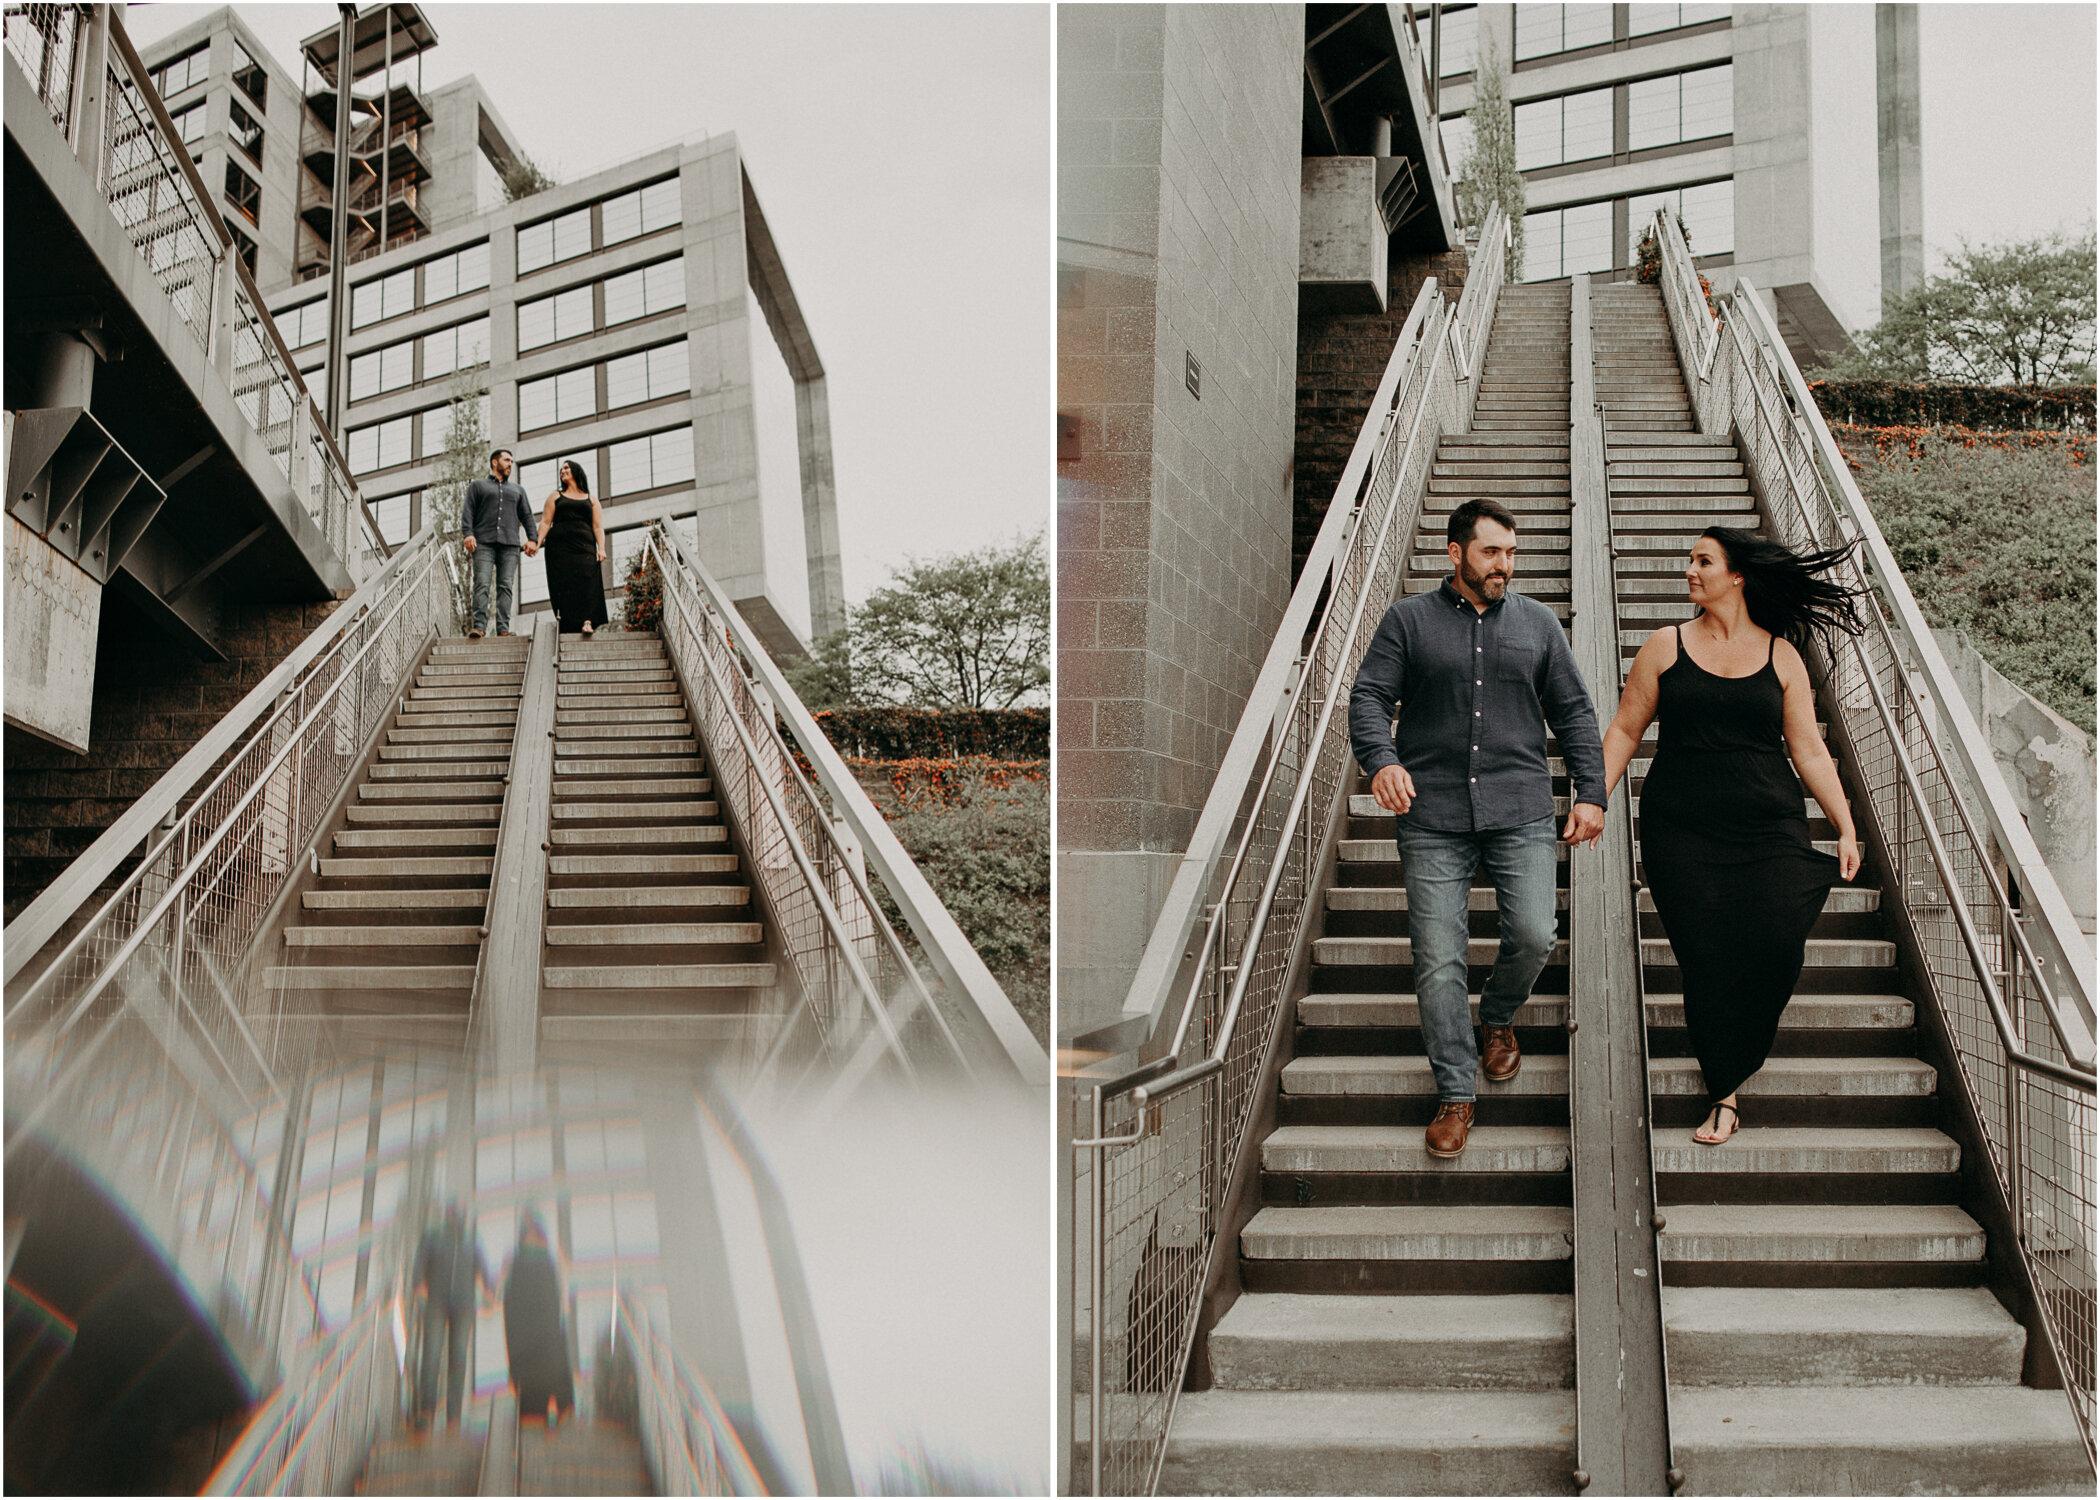 Aline_Marin_Photography_Ponce_City_Market_Atlanta_Ga_Engagement_Session_Ideas-23.jpg